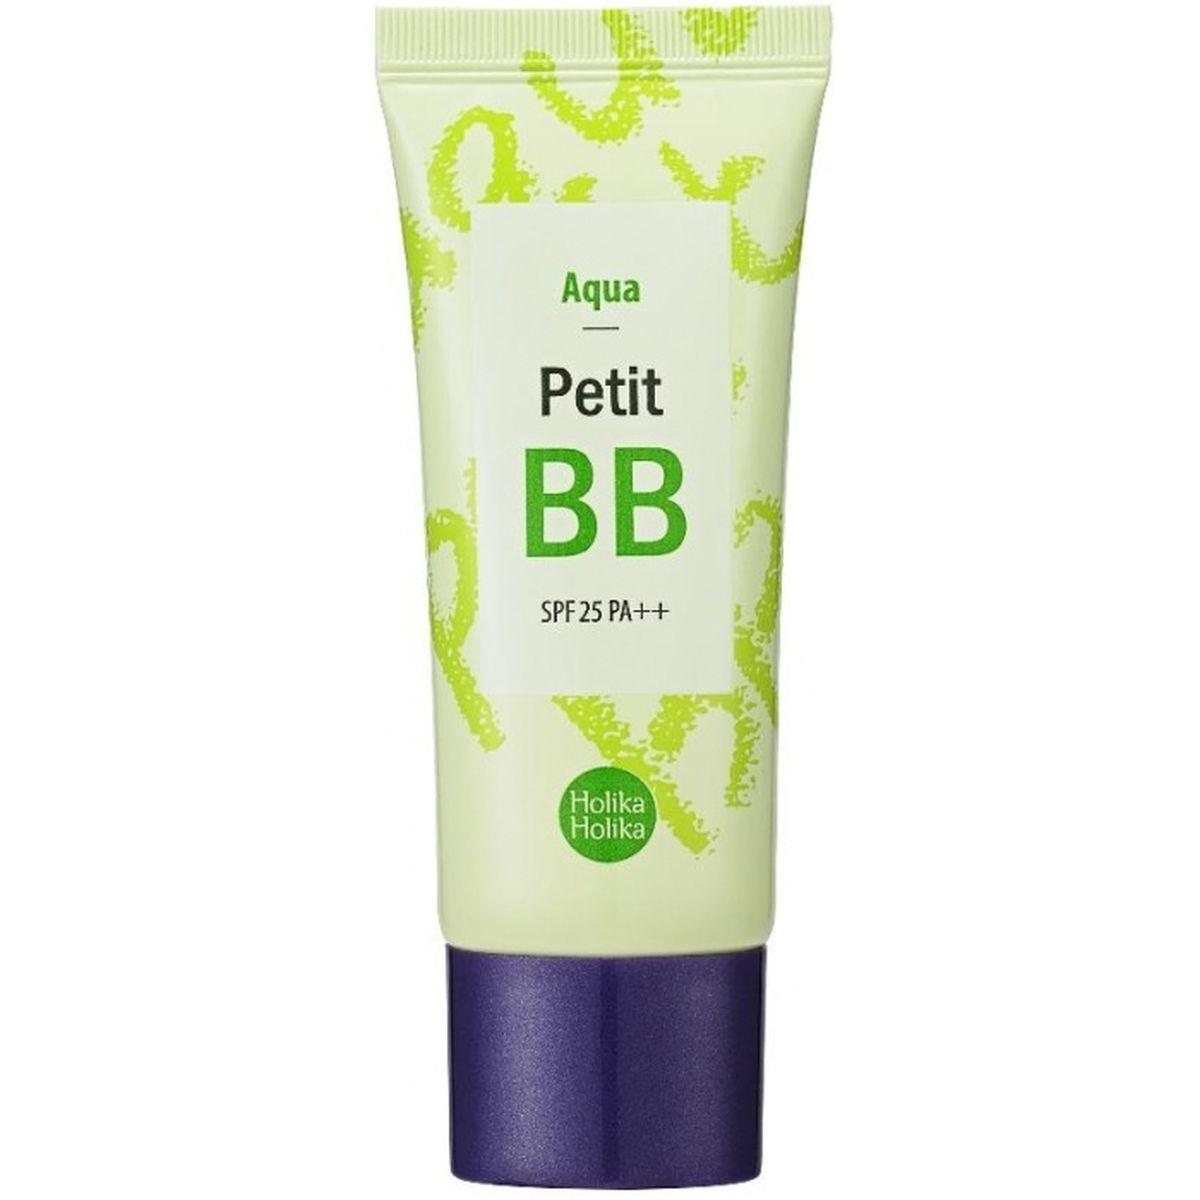 Освежающий ББ-крем HOLIKA HOLIKA Petit Aqua BB SPF25 PA++ - 30 мл